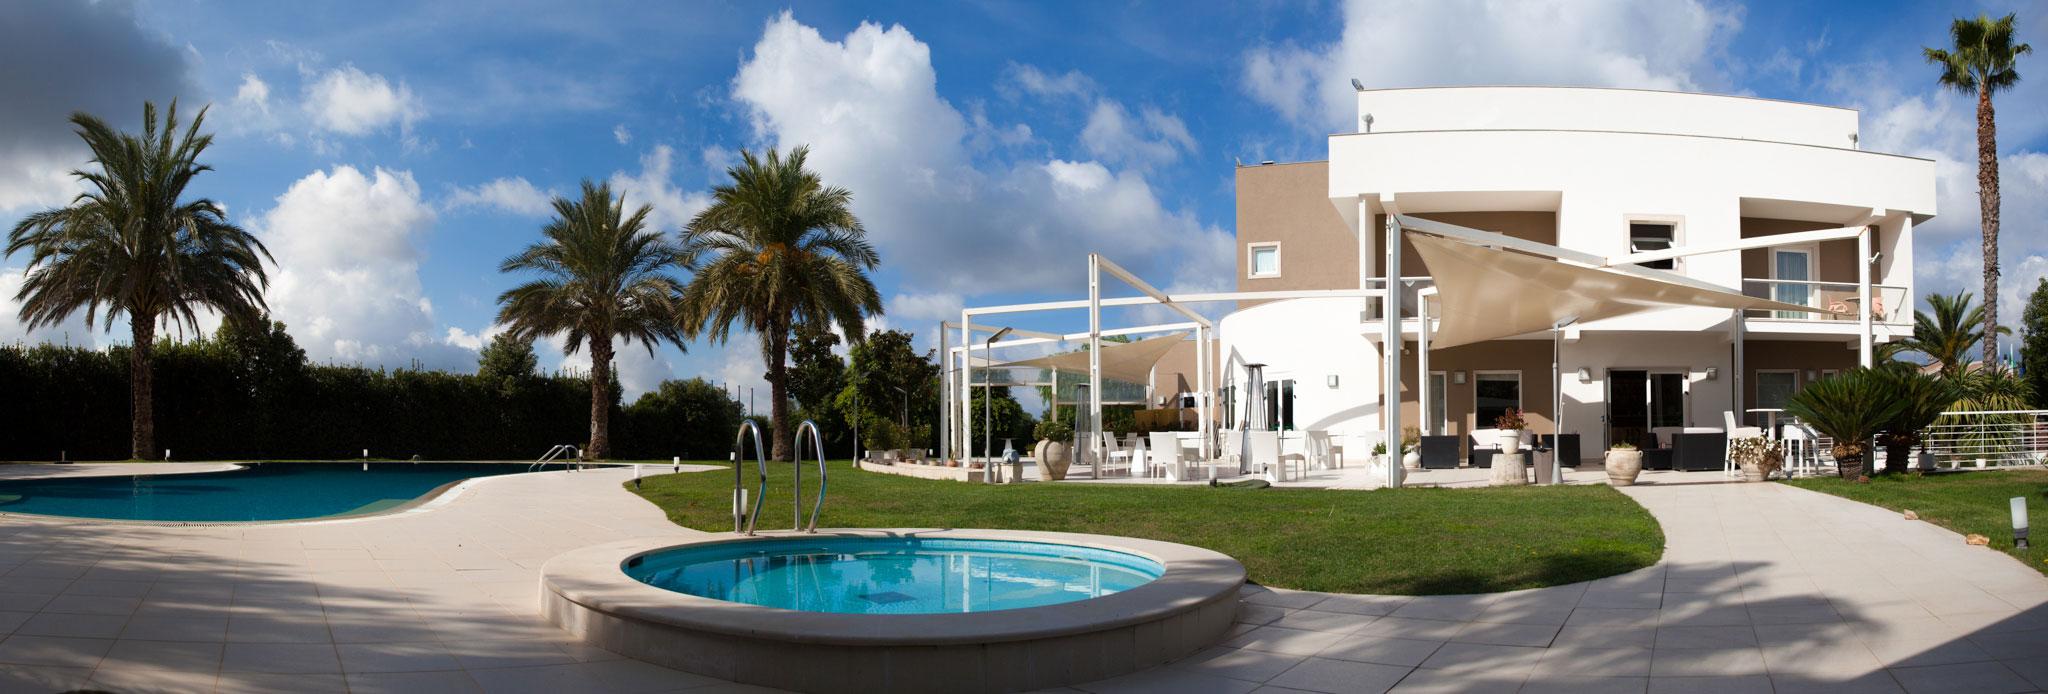 Modica Palace Hotel 4 Stelle Il Luogo Ideale Per Le Vostre